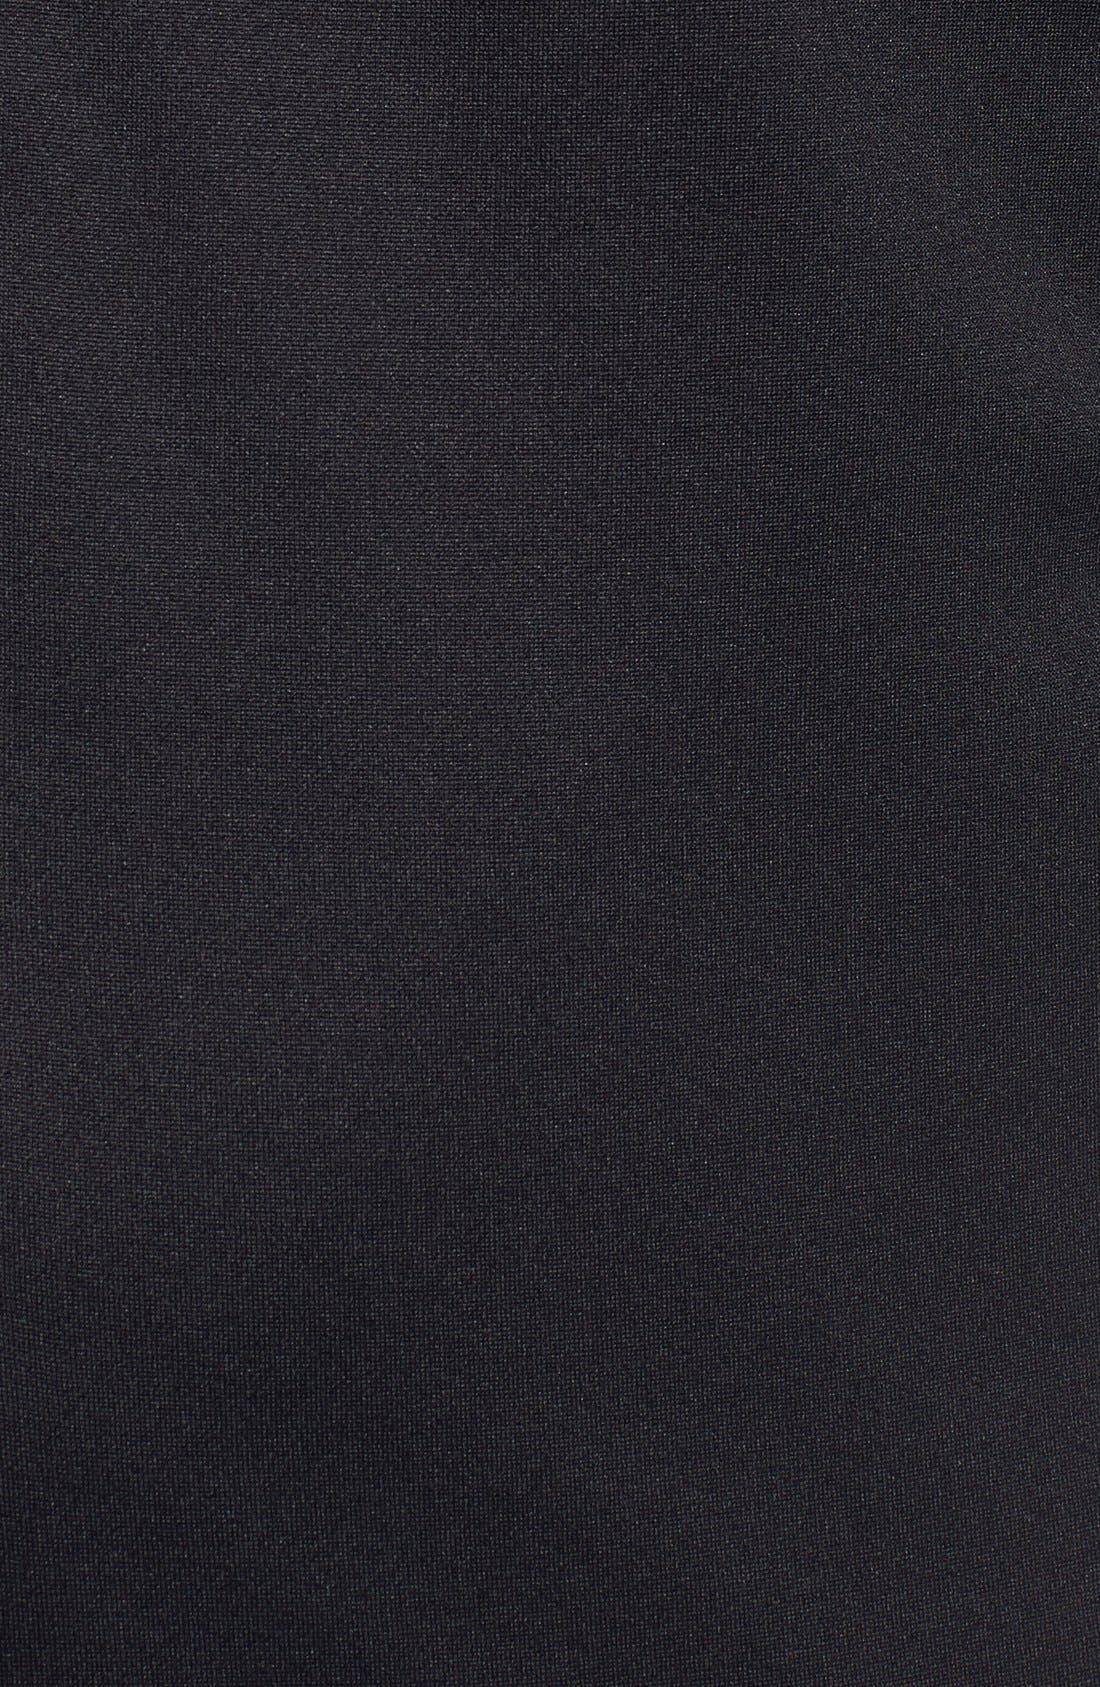 Tenacious Active Fit Hooded Jacket,                             Alternate thumbnail 5, color,                             010